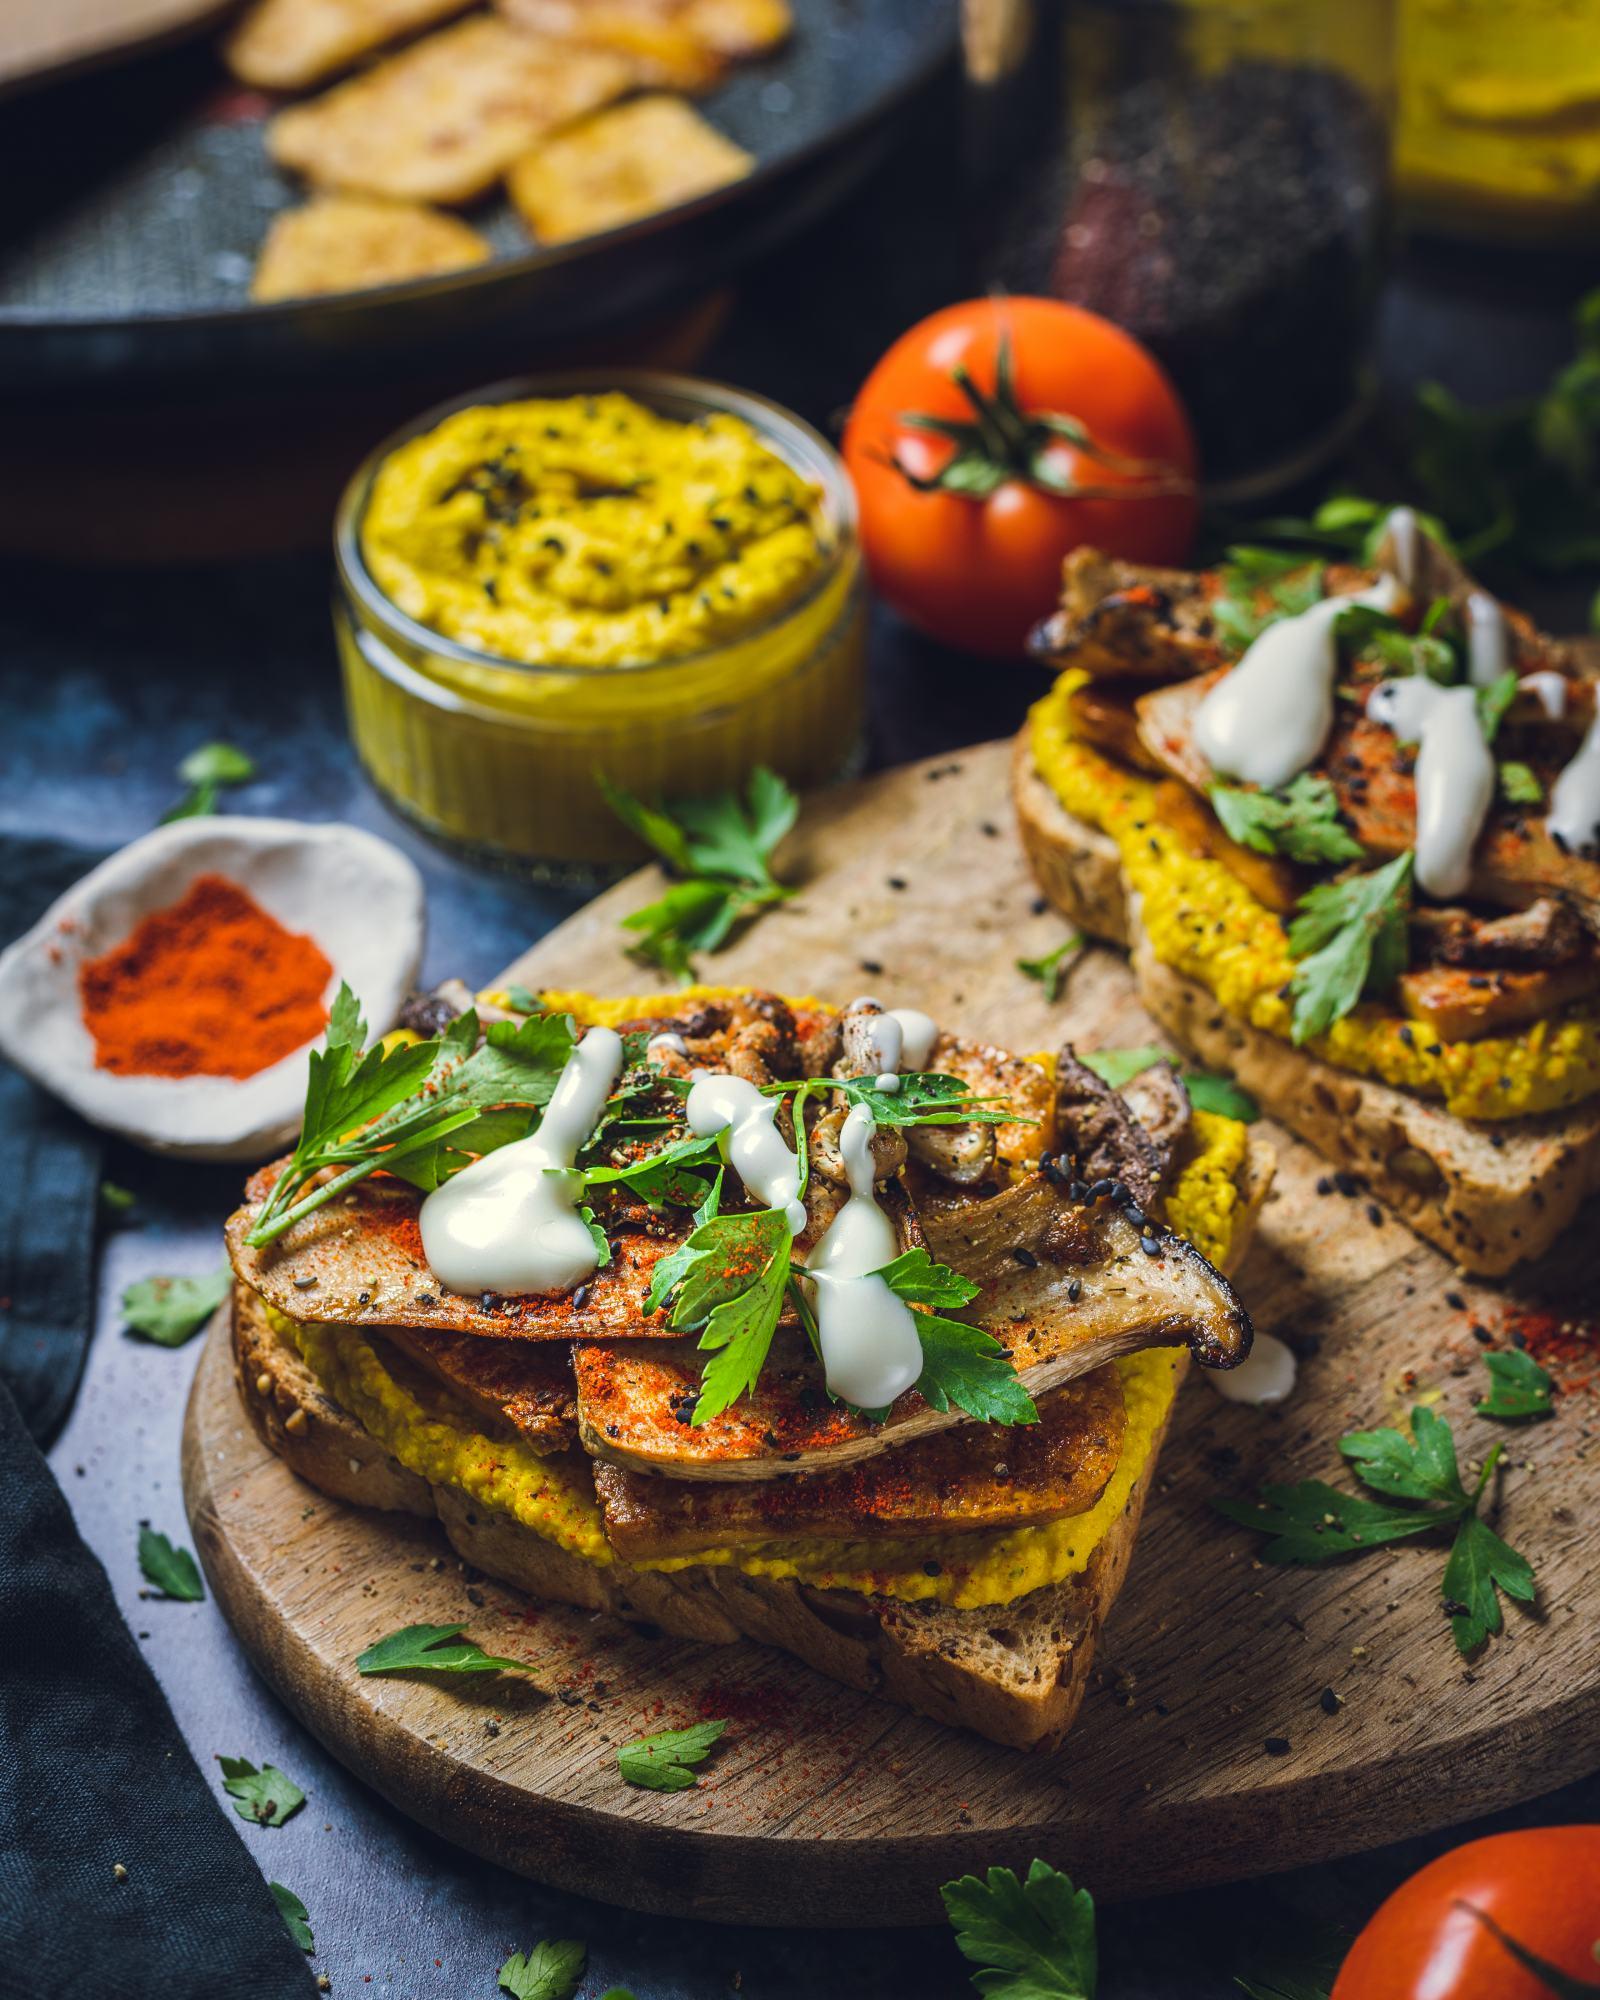 Curried Hummus and Tofu Sandwich